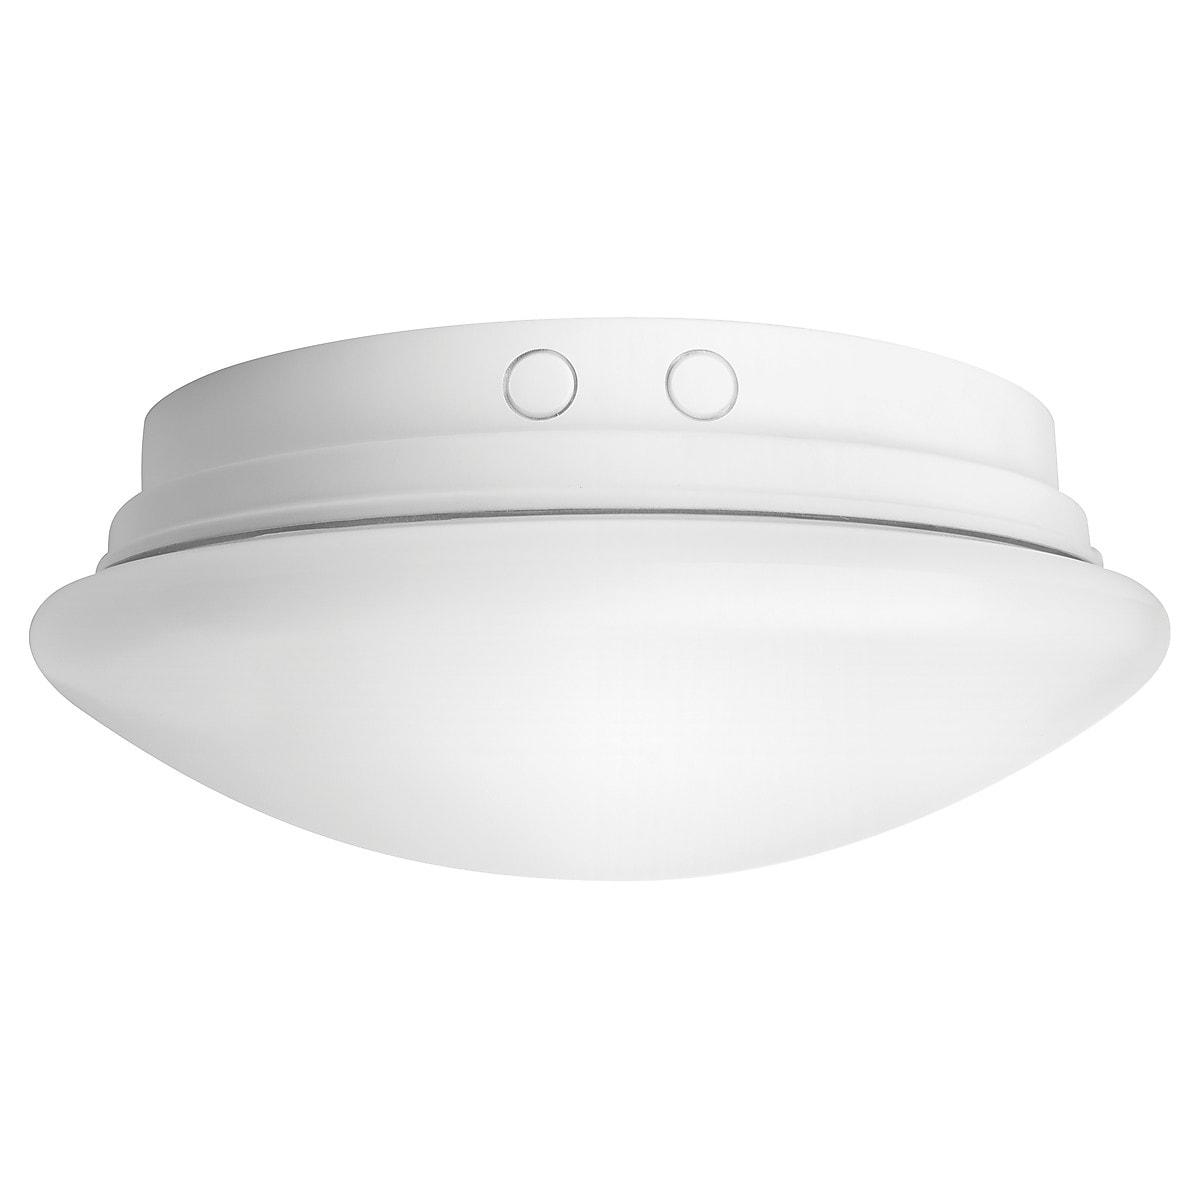 Takplafond LED med sensor